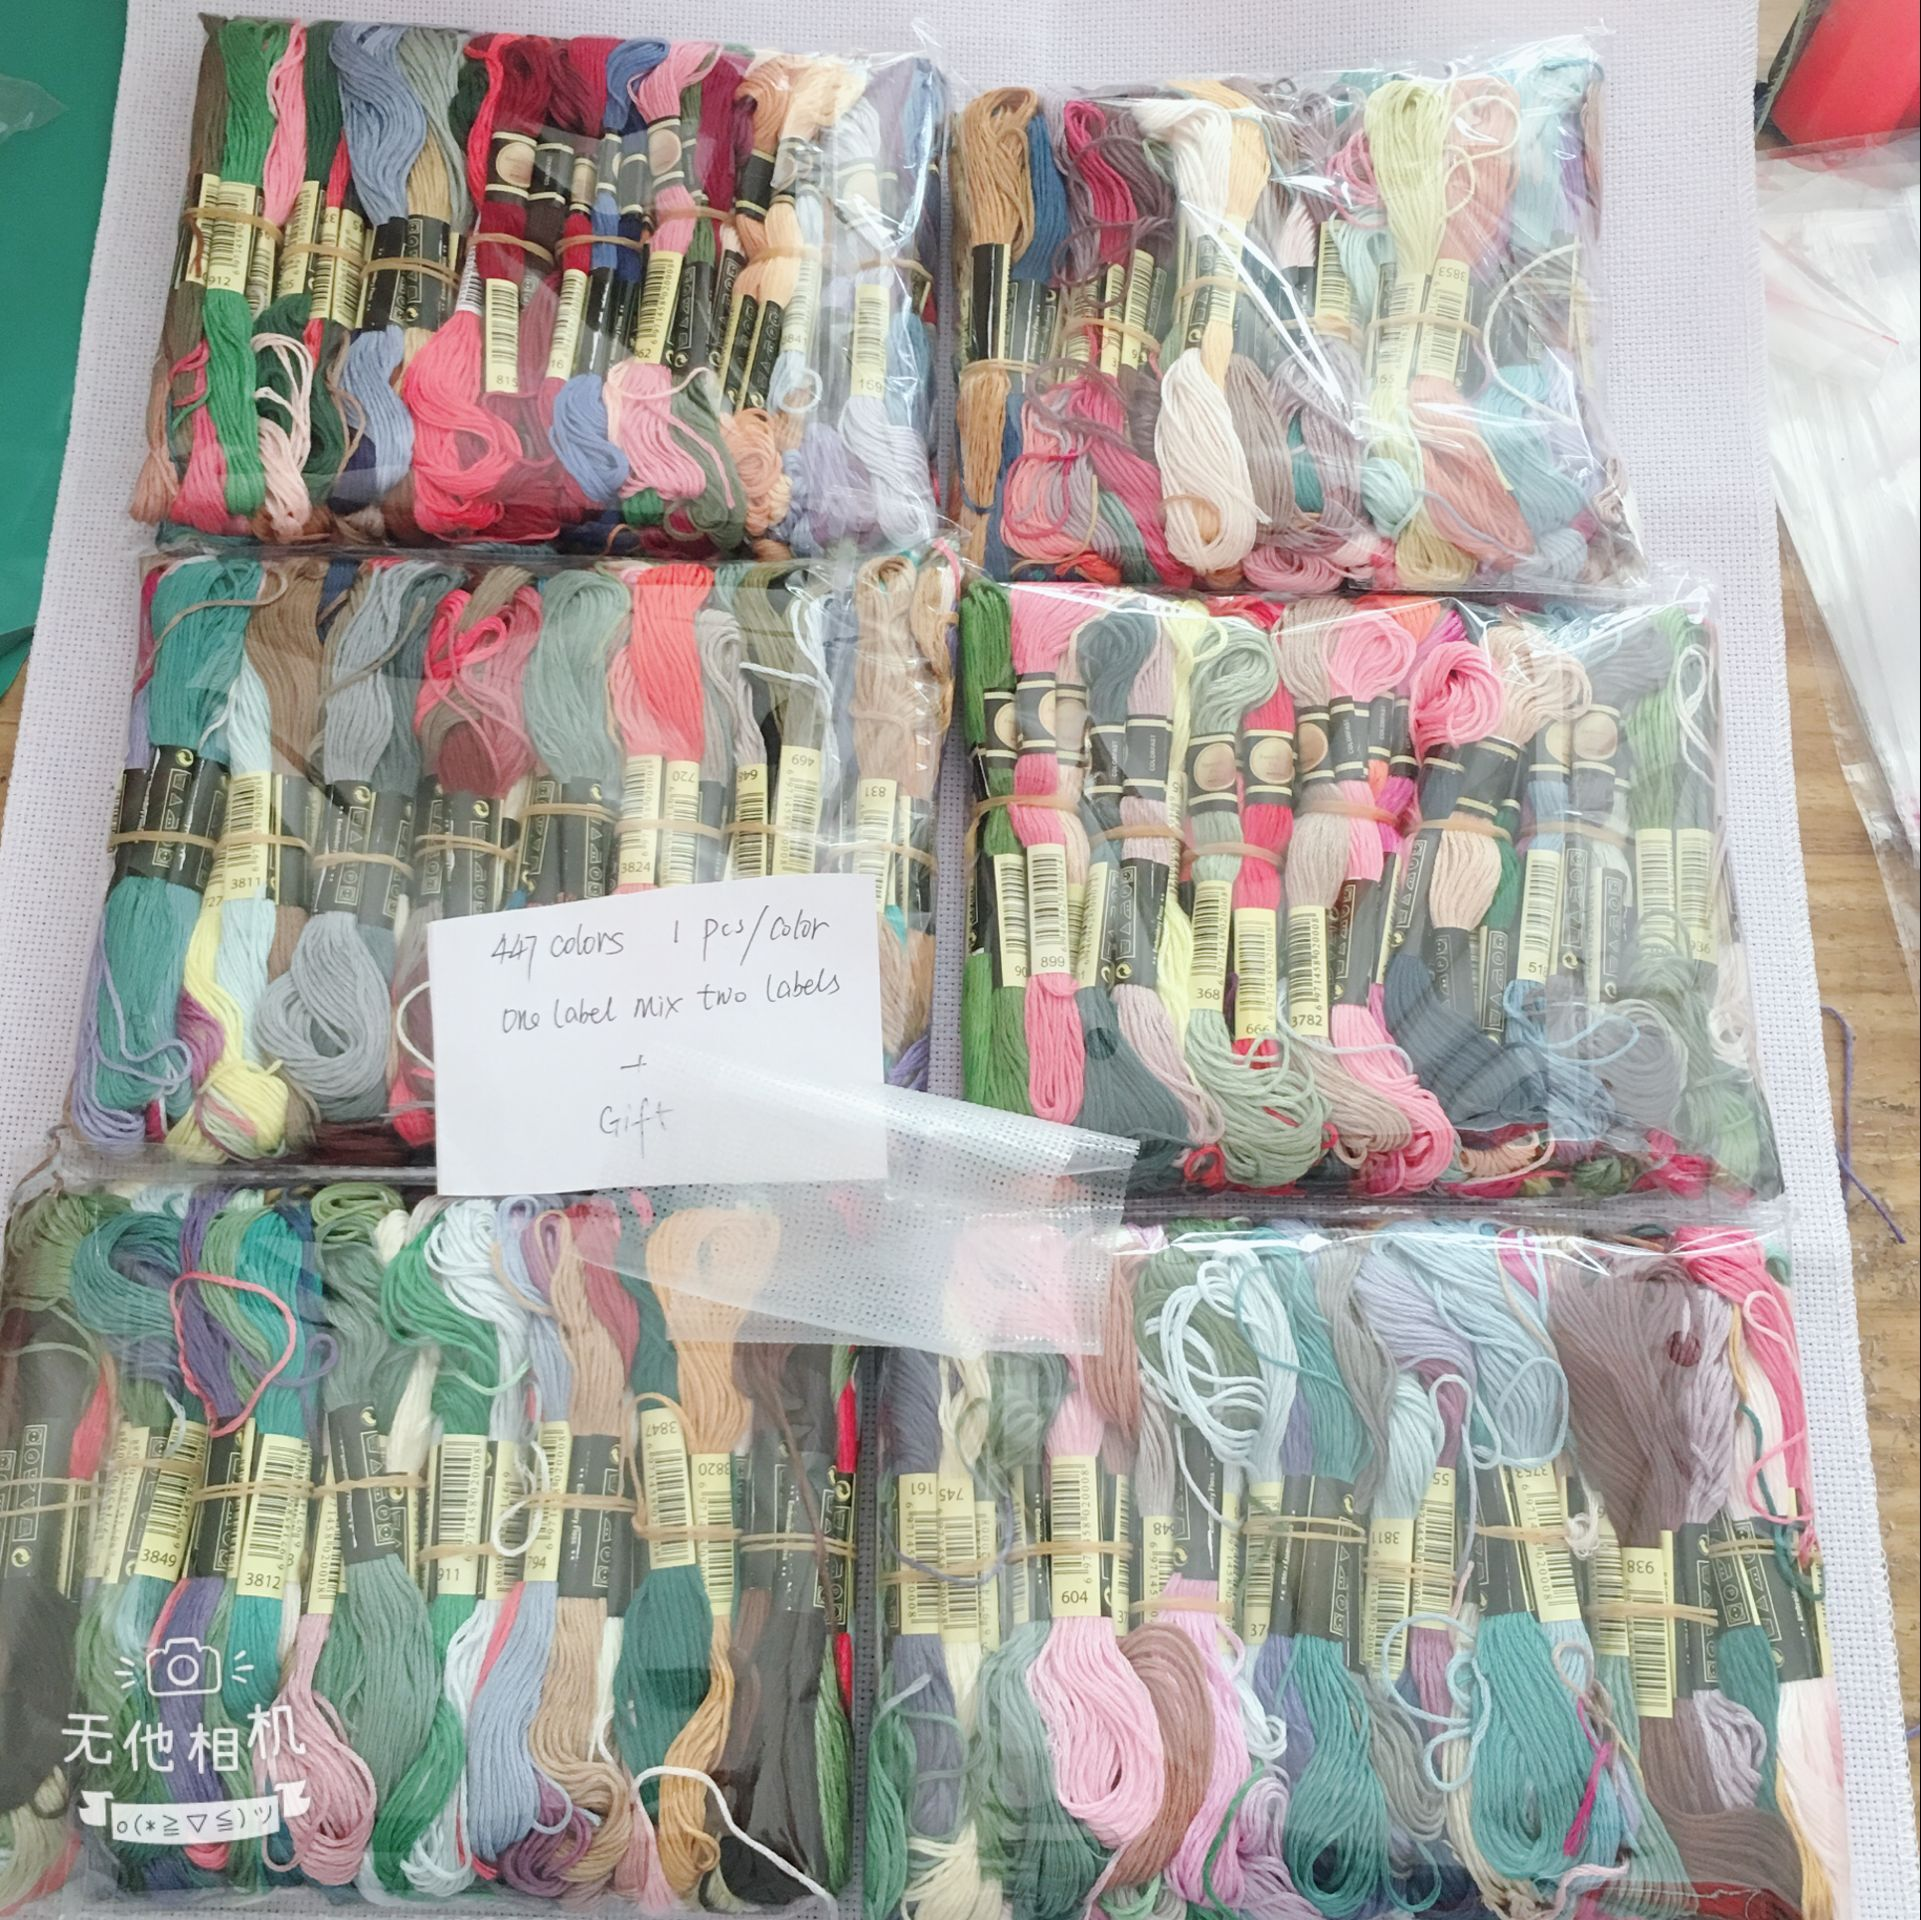 447 Colors Radom One/two Labels Mix Similar Dmc Threads Embroidery Cross Stitch Floss Yarn Thread Cross Stitch Set Gift Choose 1